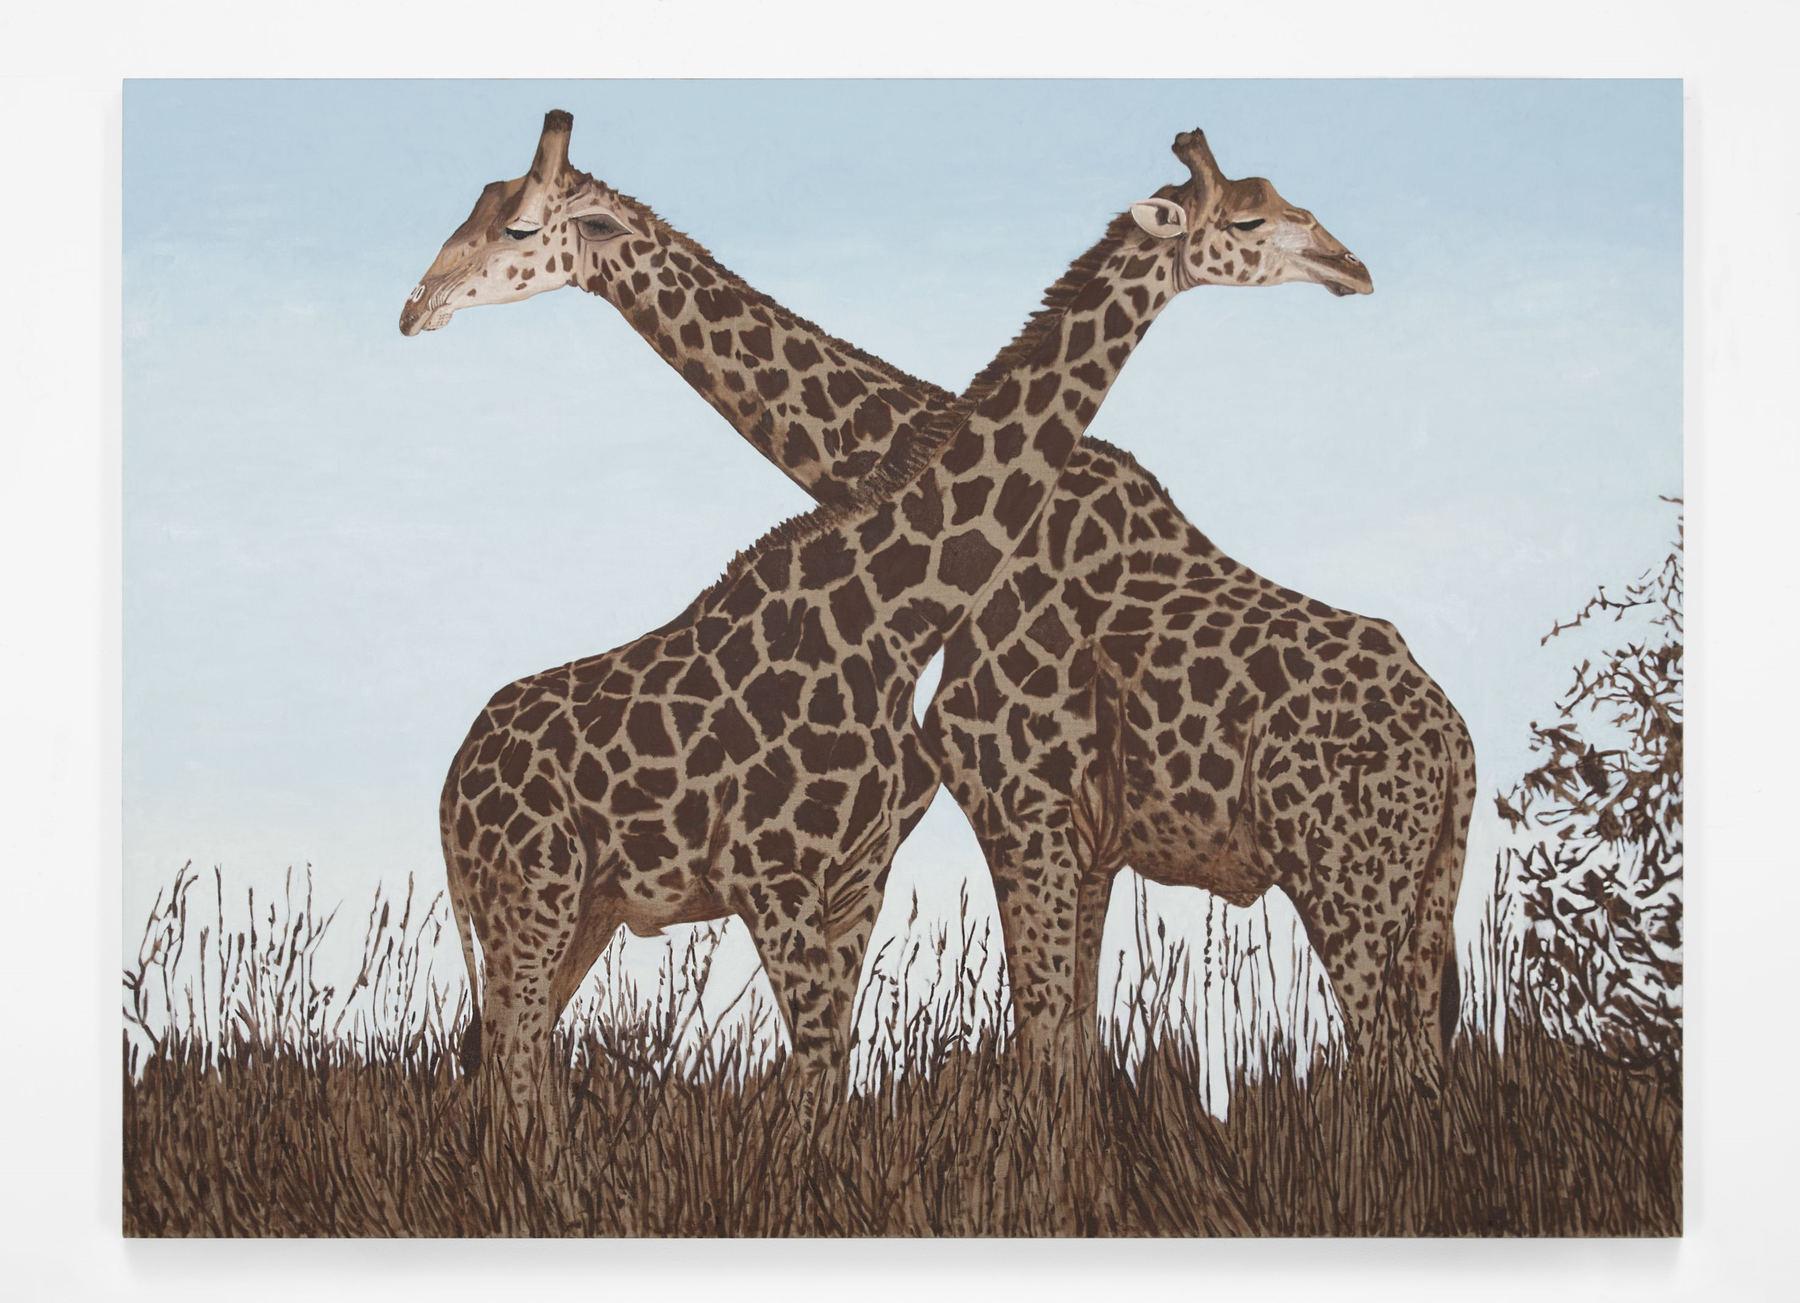 LC_Two Giraffes _300dpi